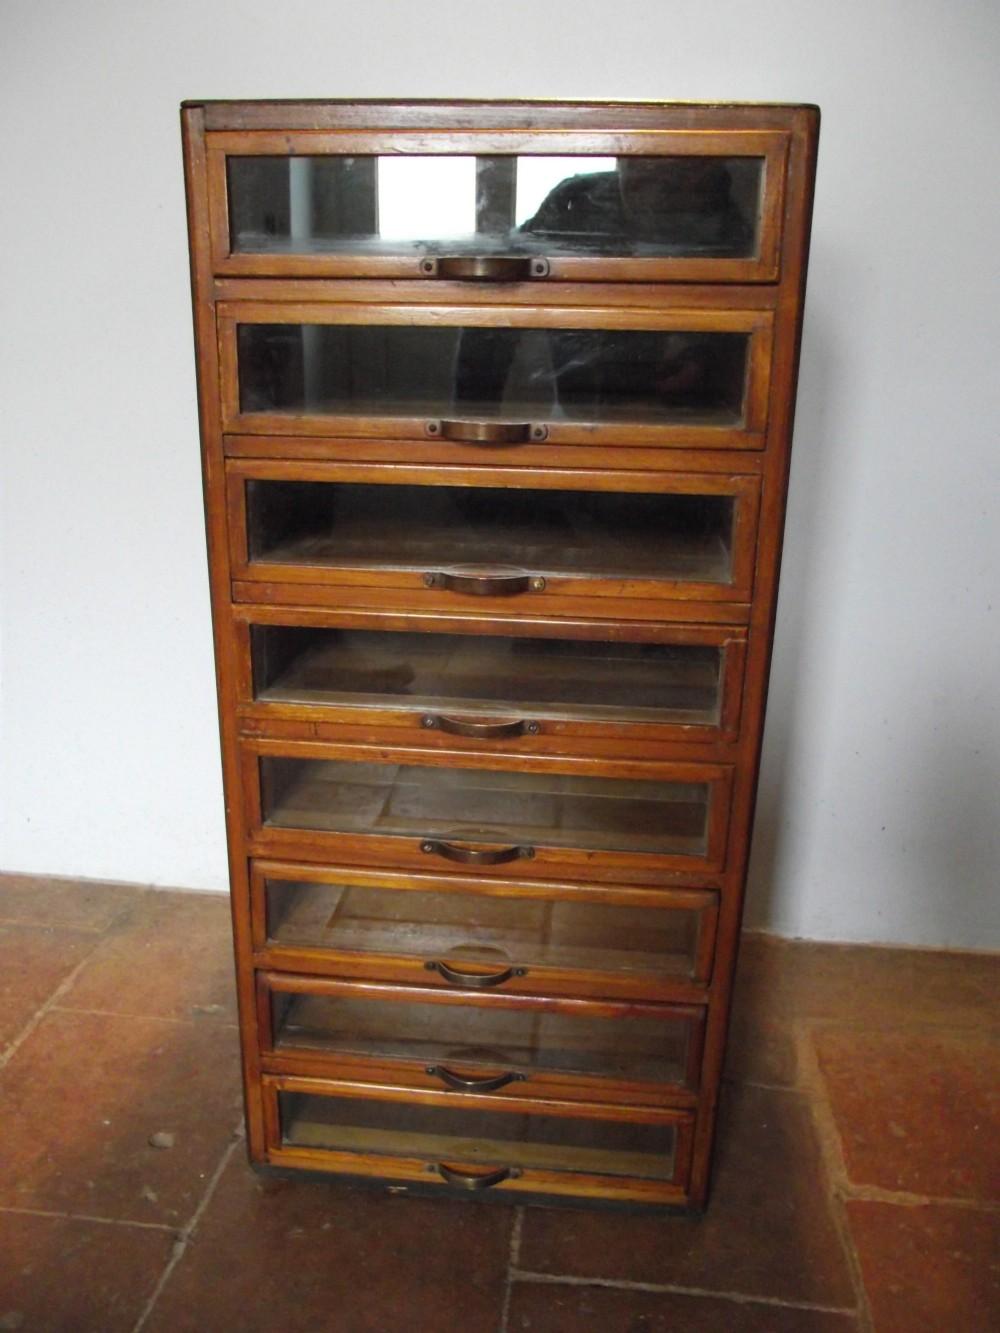 Attrayant 192030s Small Size Haberdashery Cabinet